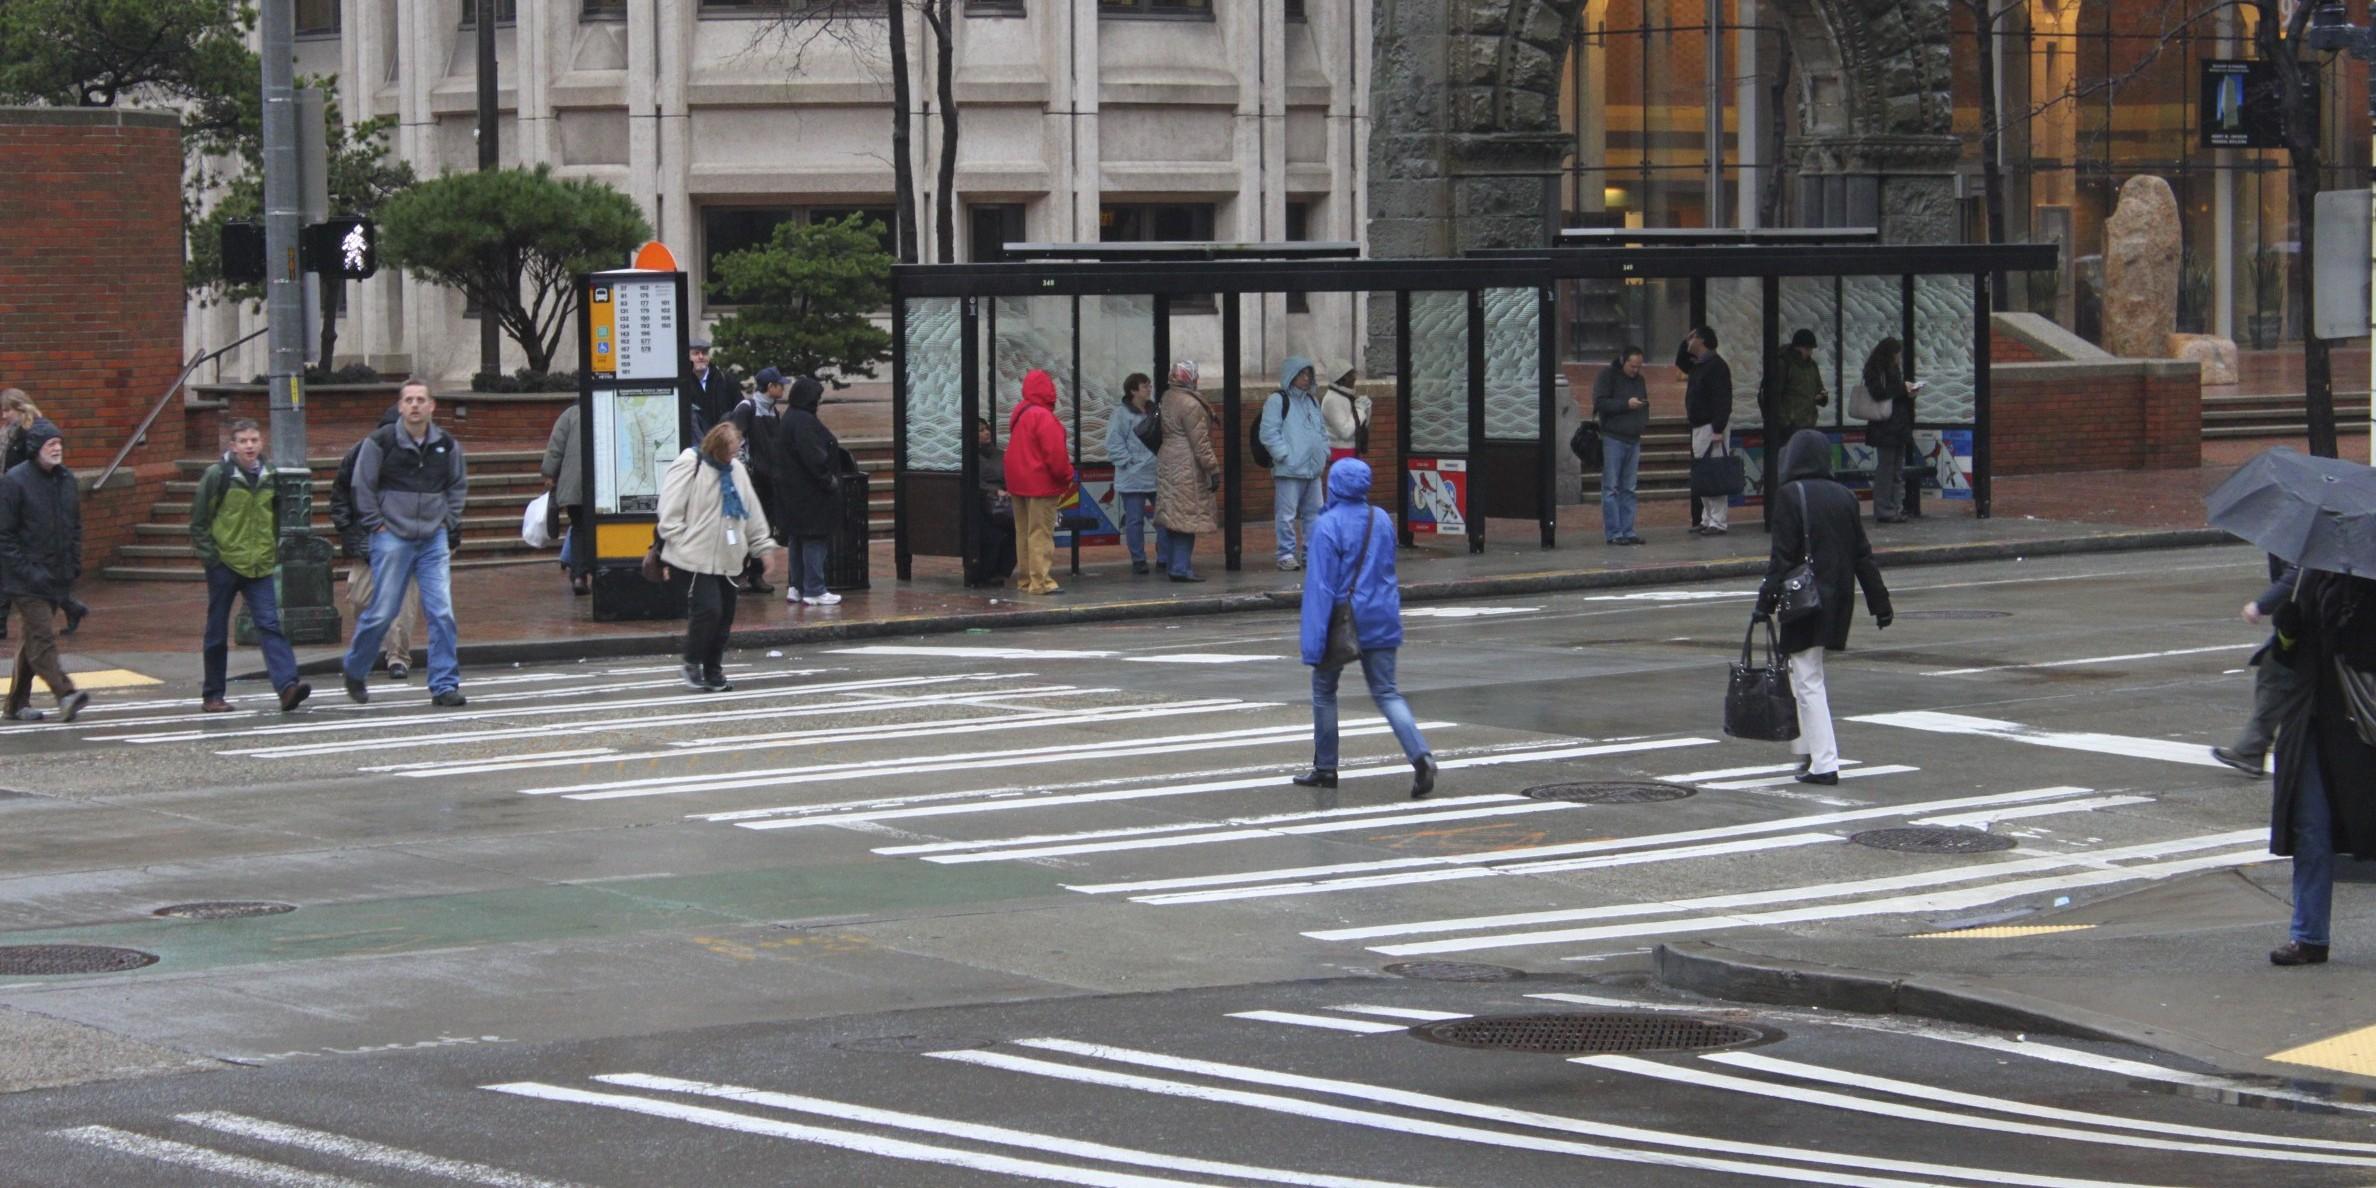 Immediate Credit Card >> Pedestrian Access & Networks | National Association of City Transportation Officials